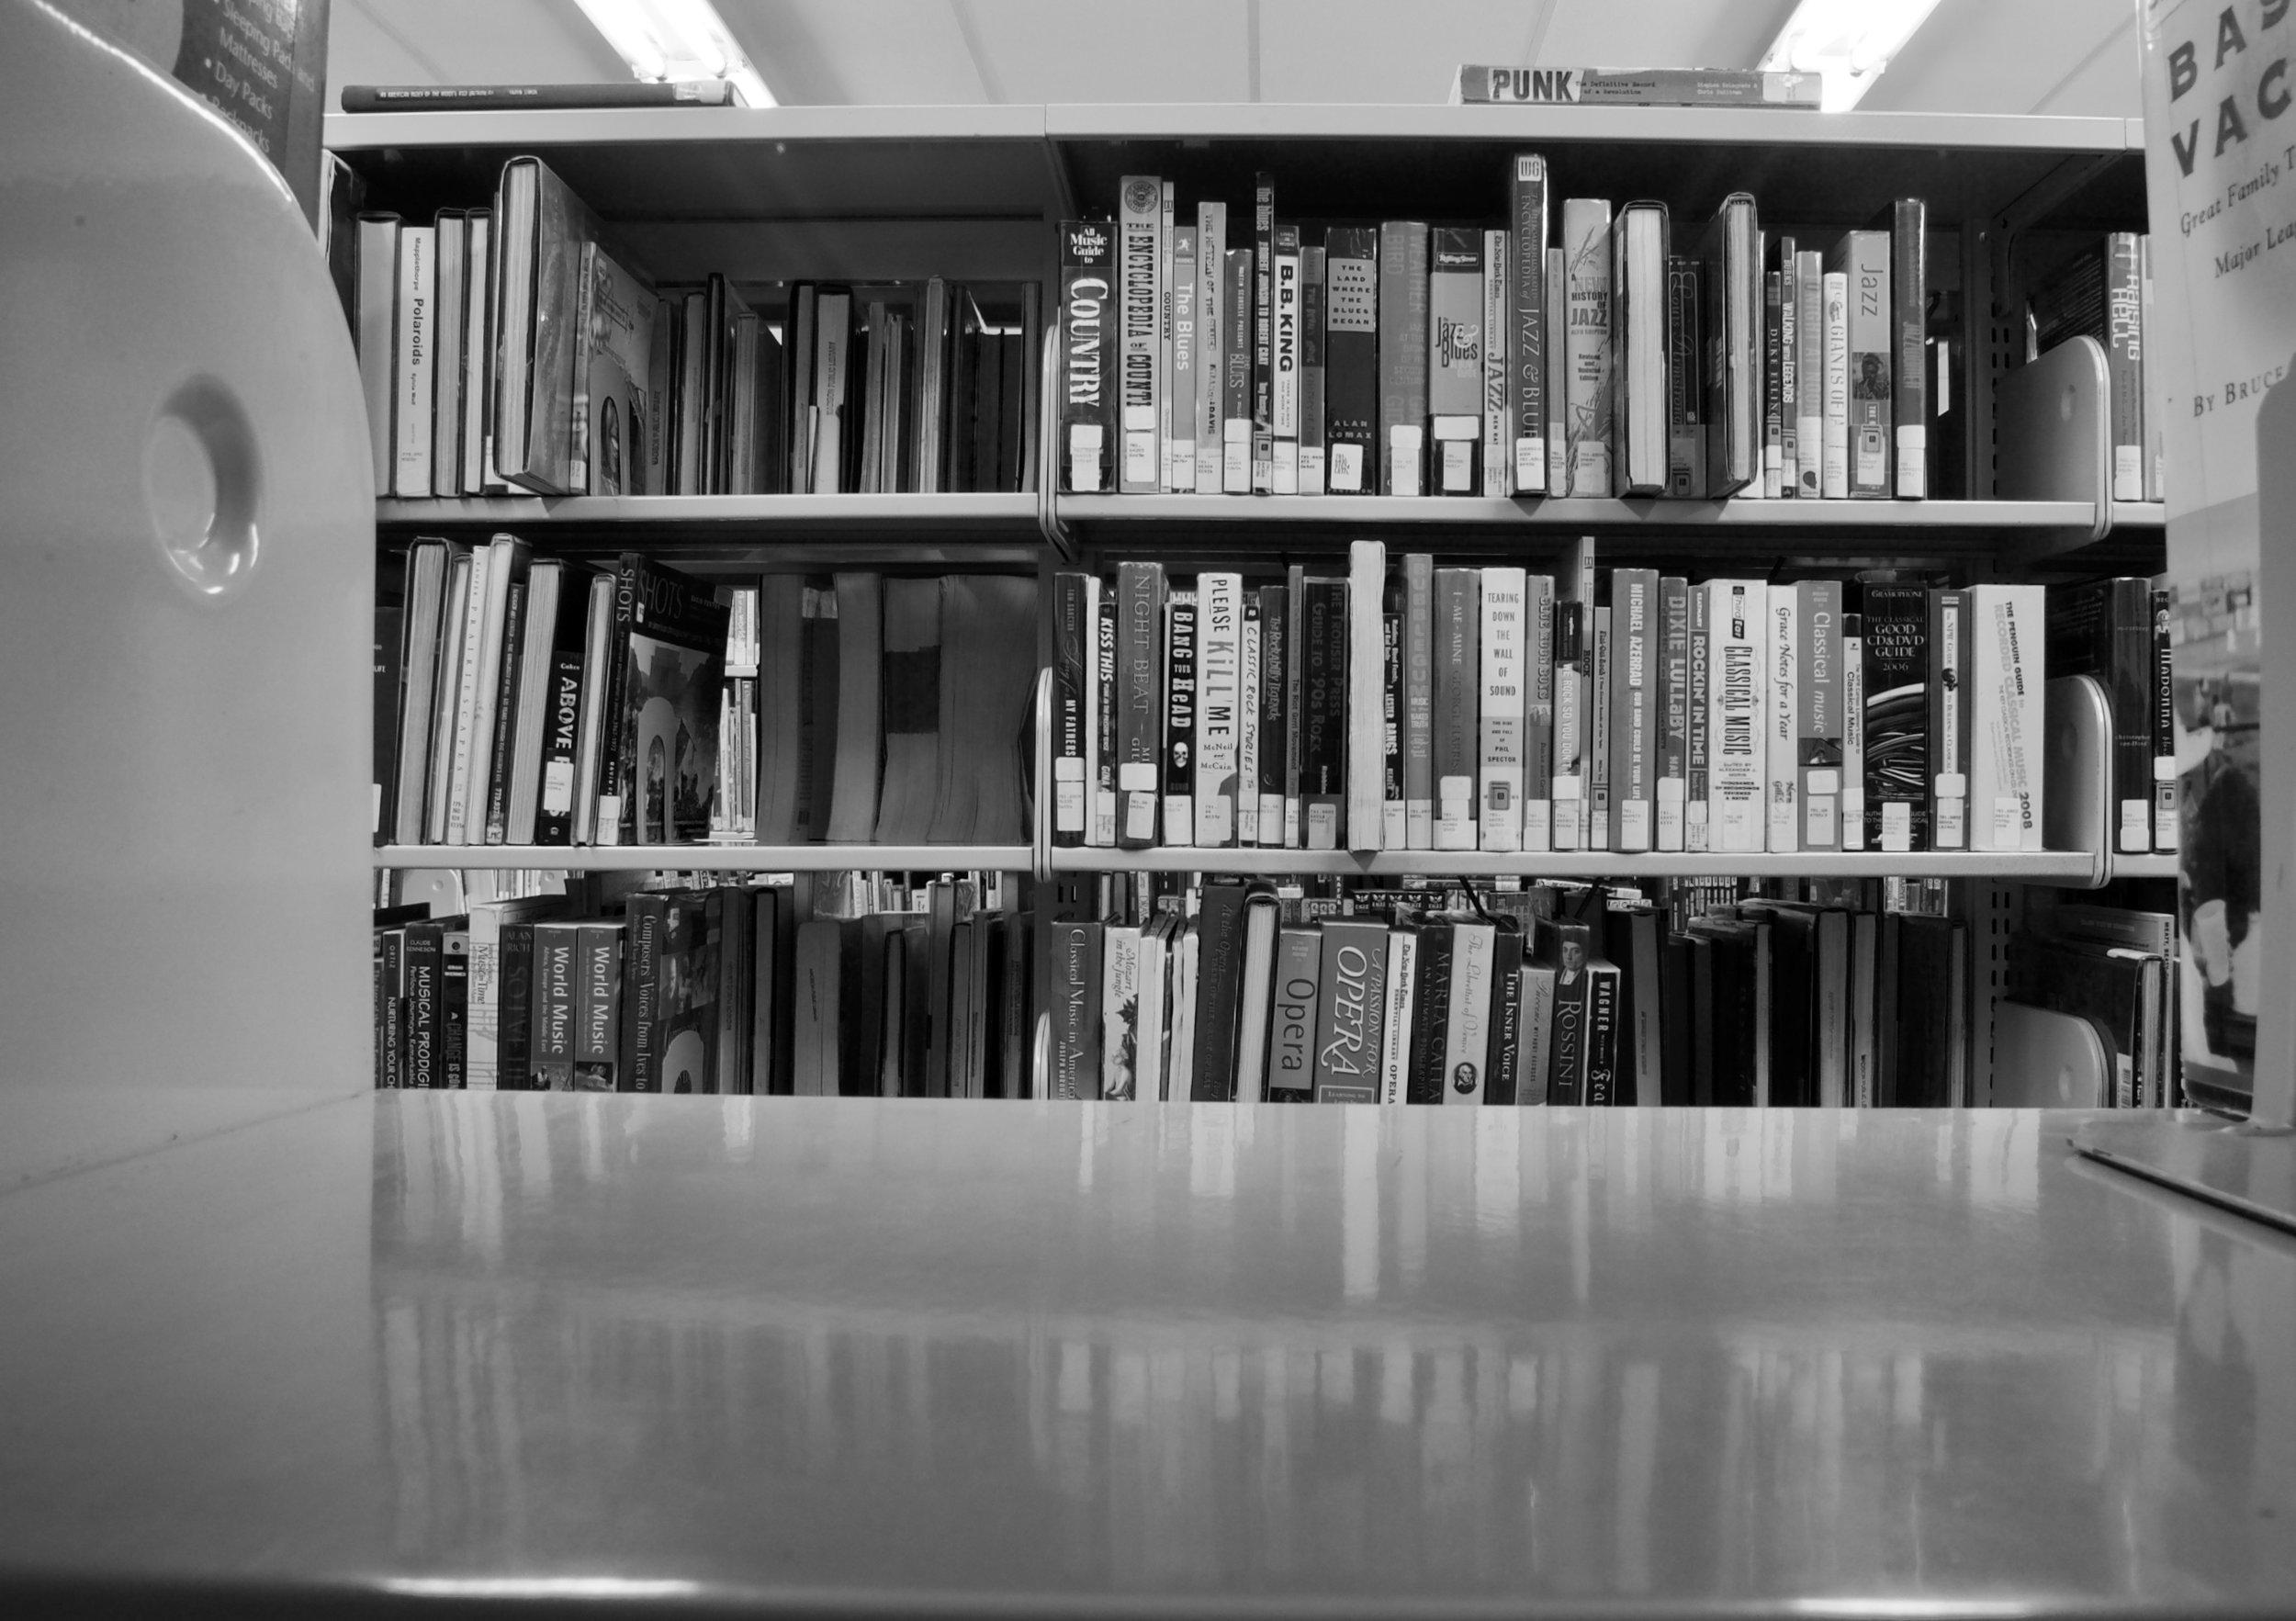 Punk. Former Sequoya Library. Madison, Wisconsin. October 2008. © William D. Walker